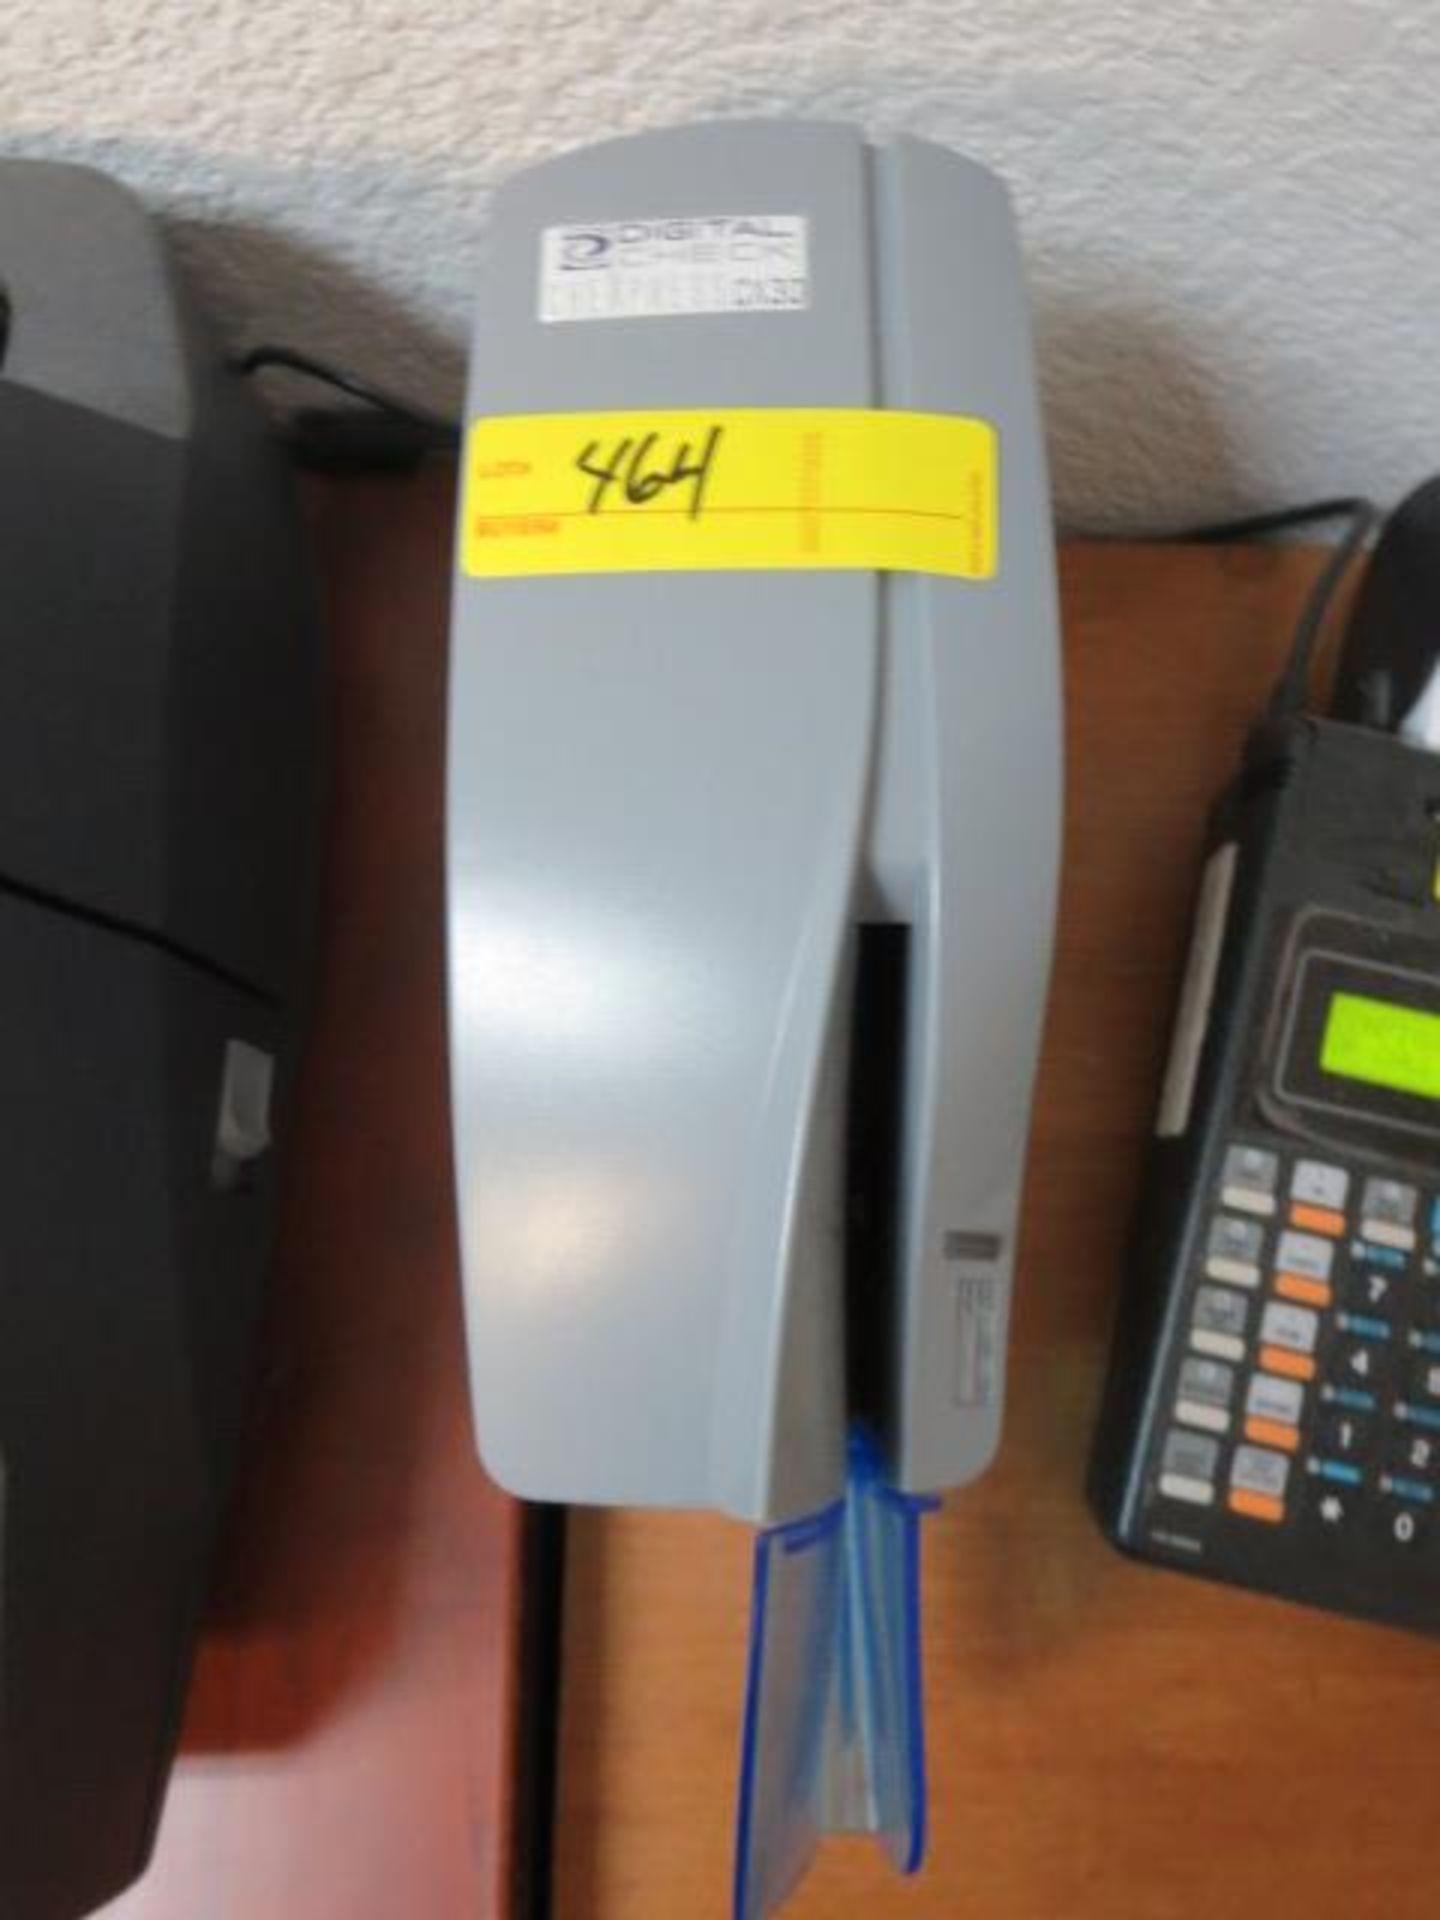 Lot 464 - Digital Check Chexpress Check Scanner, model CX30